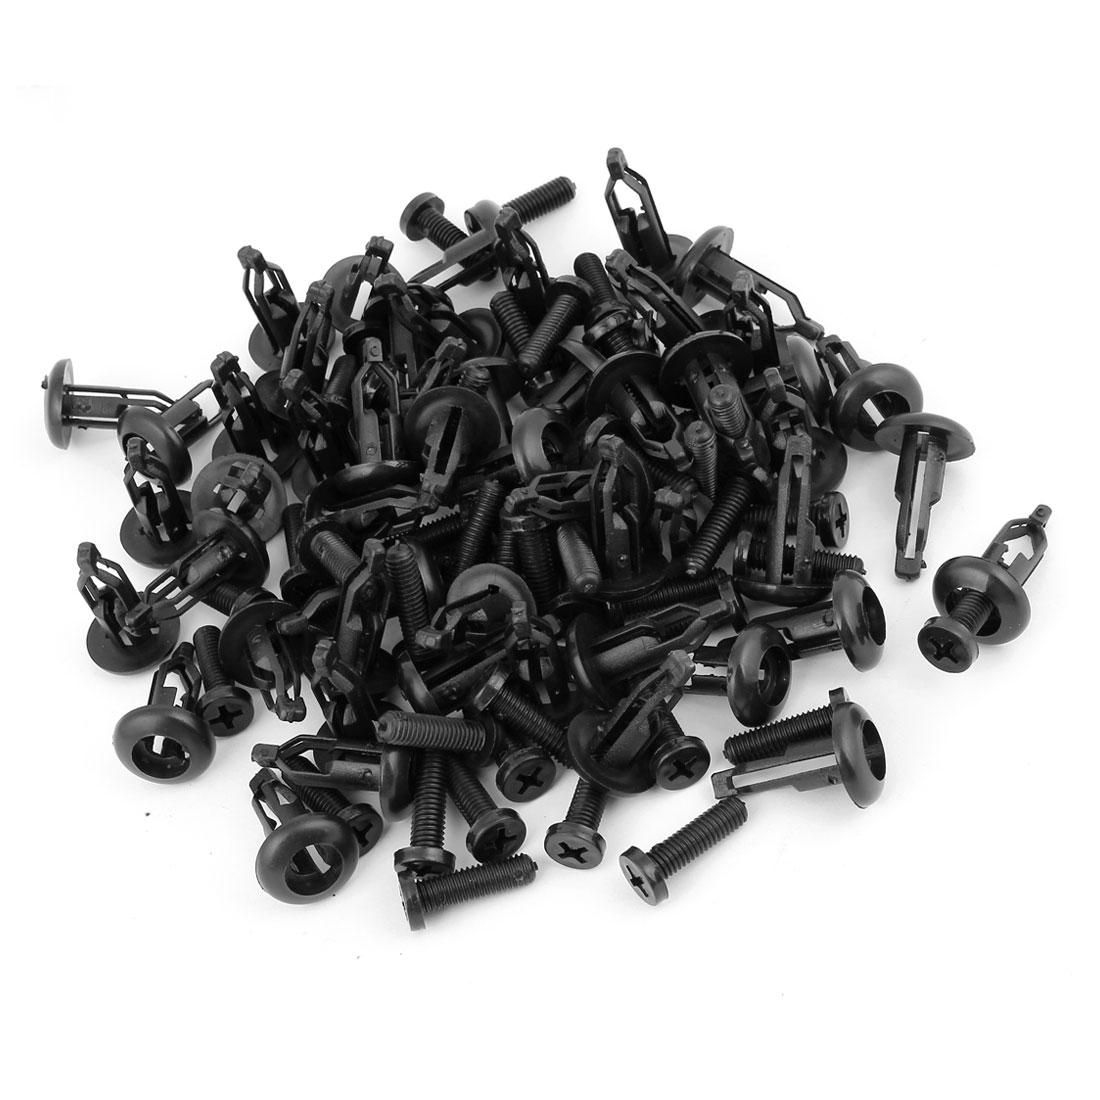 50pcs Plastic Trim Boot Rivets Retainer Clip Black 8.5mm Dia Hole for Car